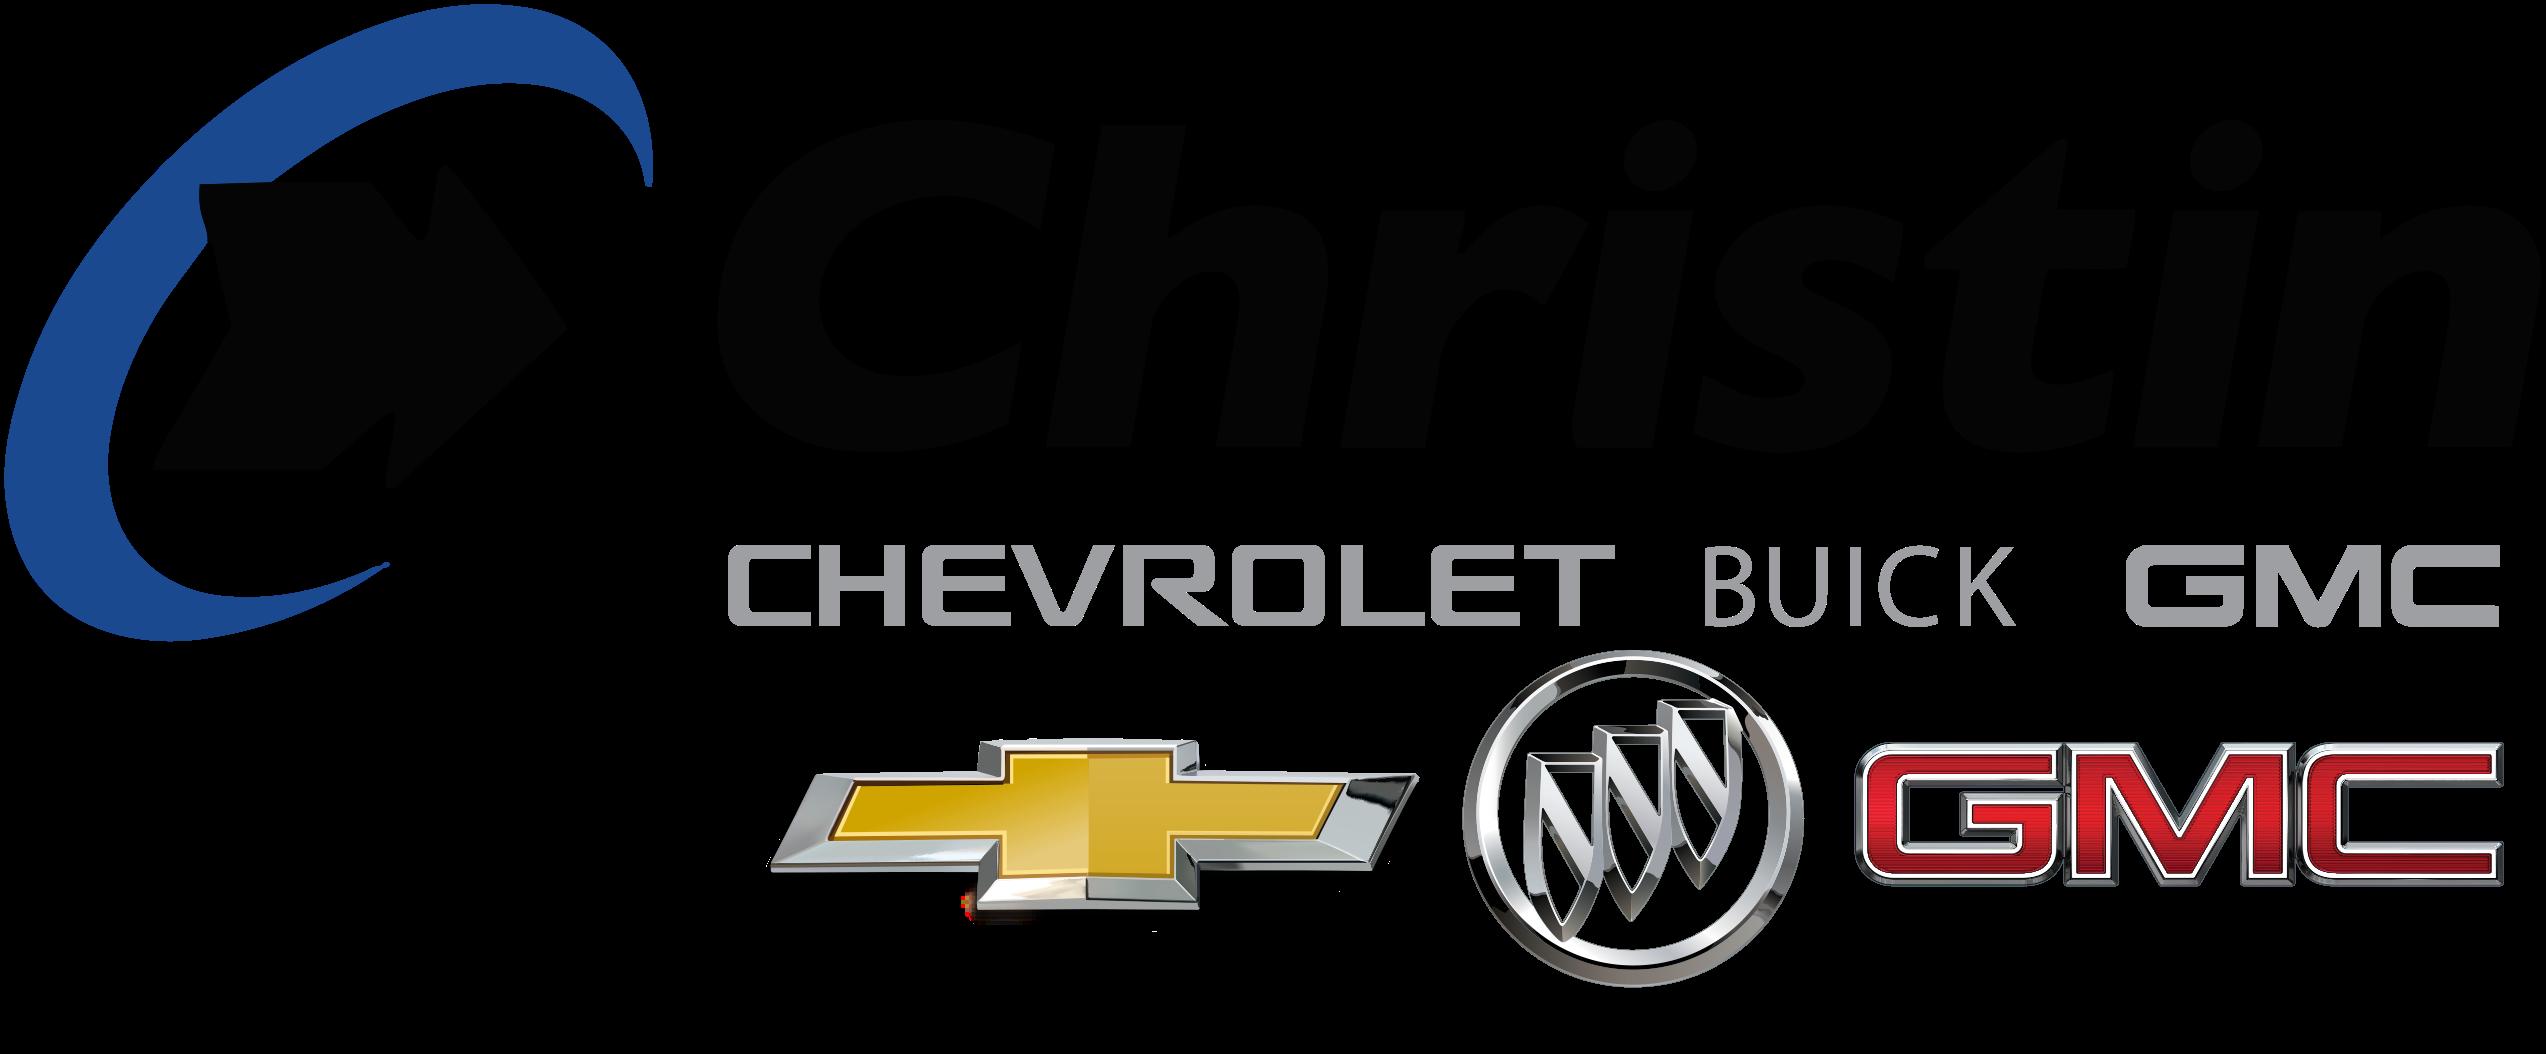 Christin Chevrolet Buick Gmc Gmc Chevrolet And Buick Dealership